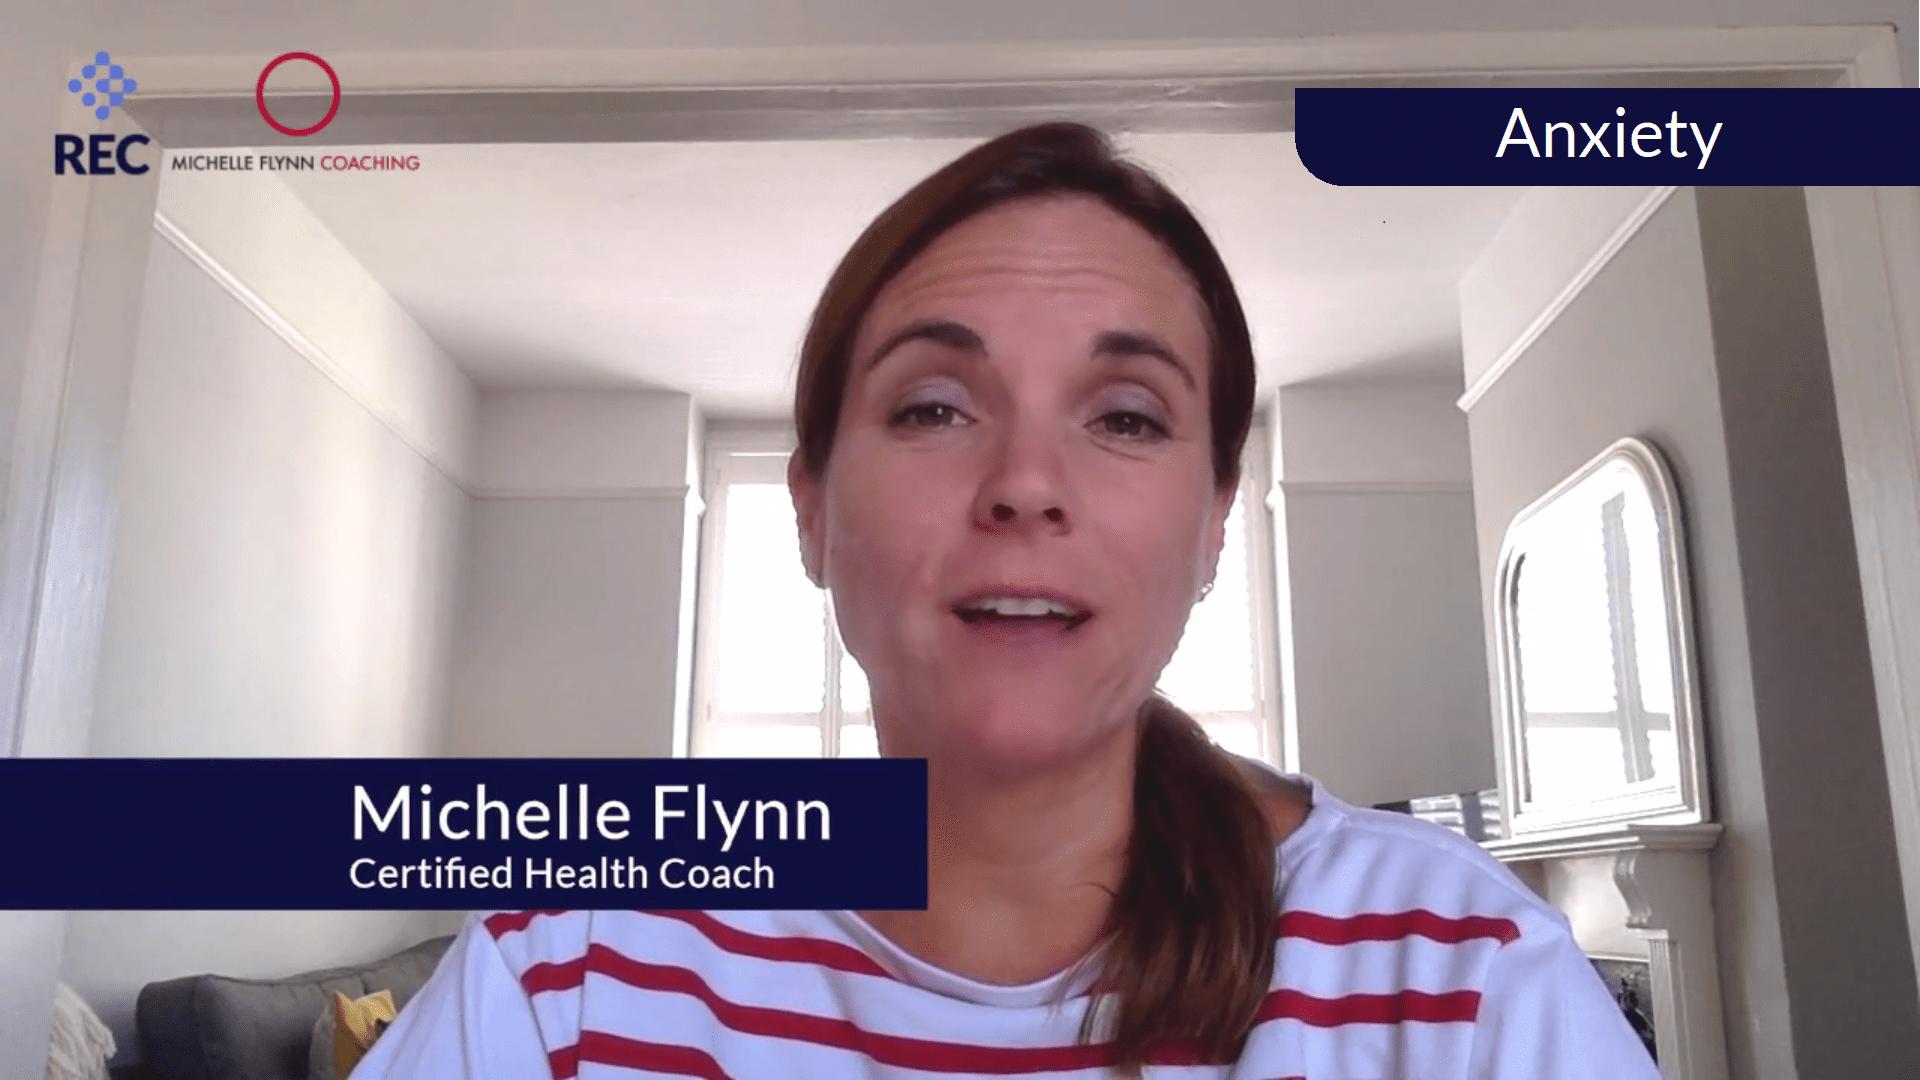 Anxiety, Michelle Flynn